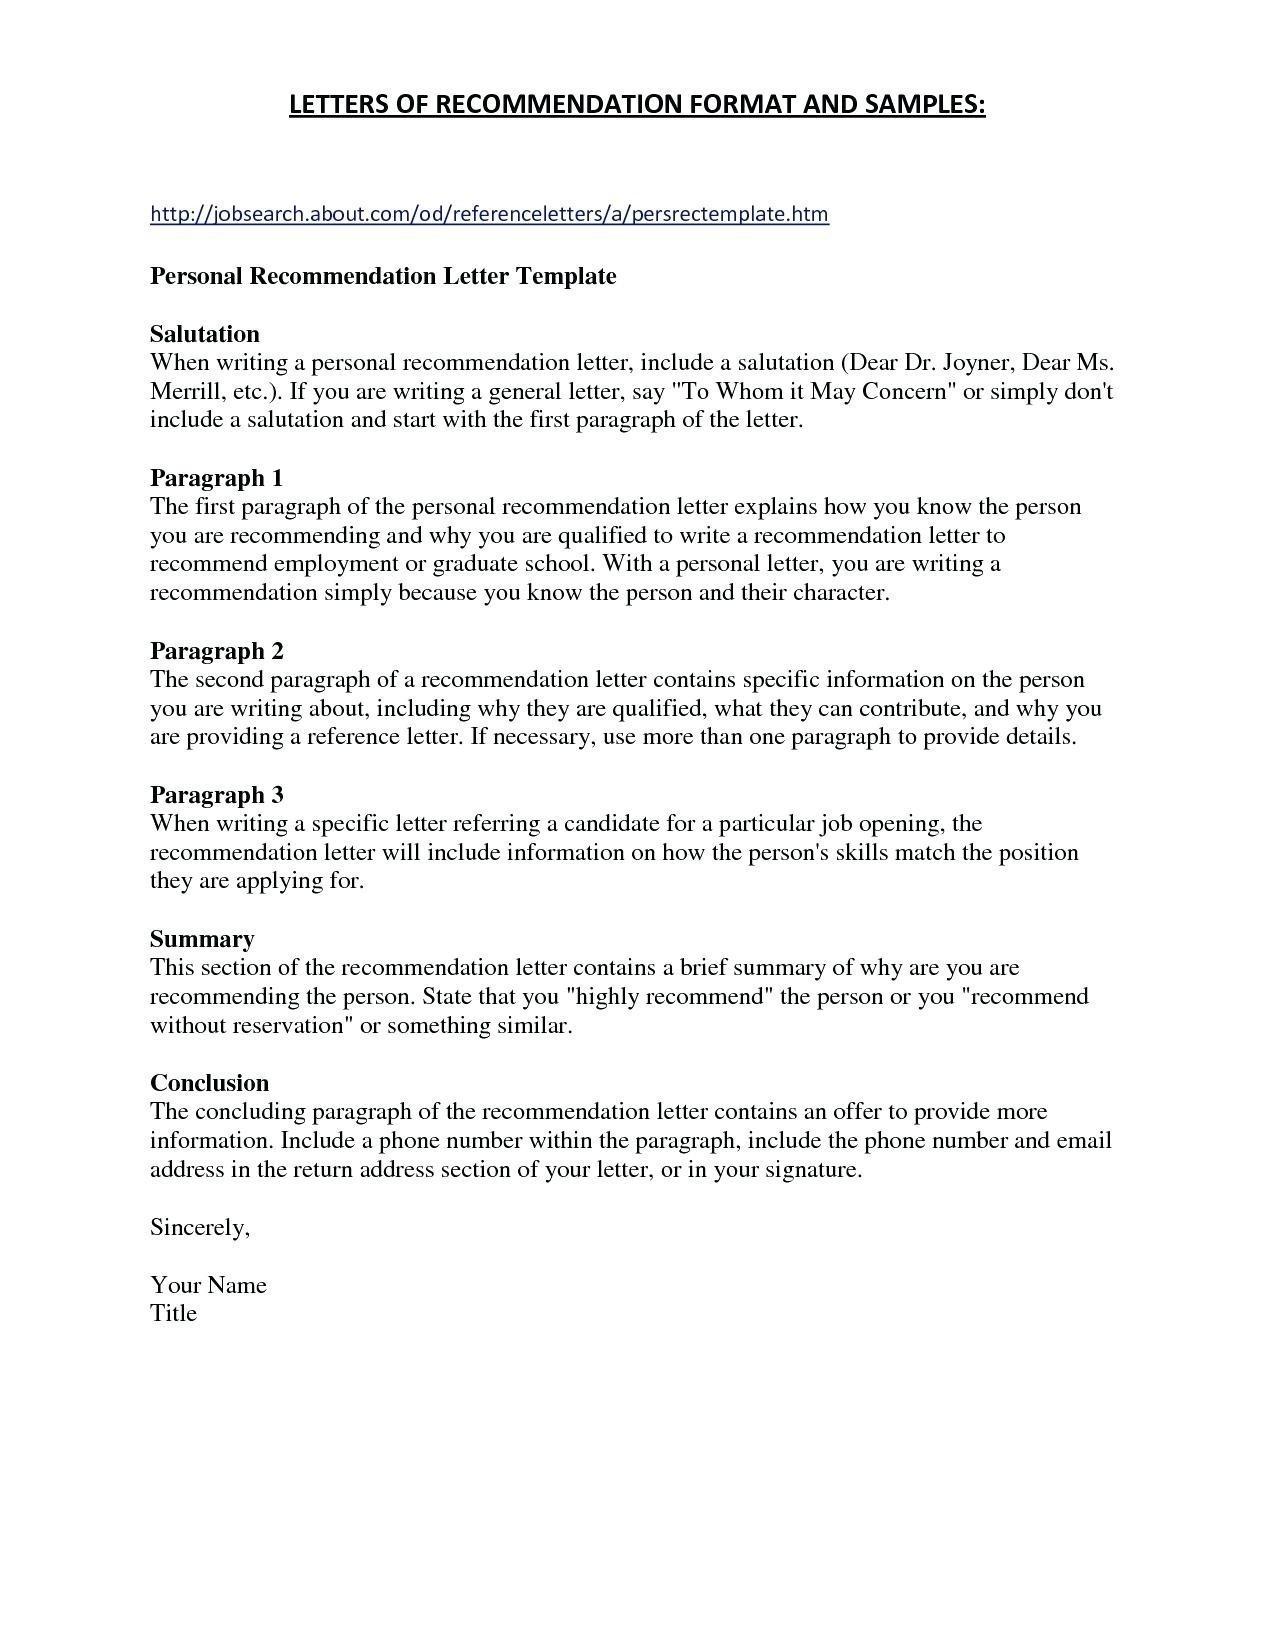 Job Reference Letter Template - Job Fer Cancellation Letter Fresh Job Fer Cancellation Letter Best